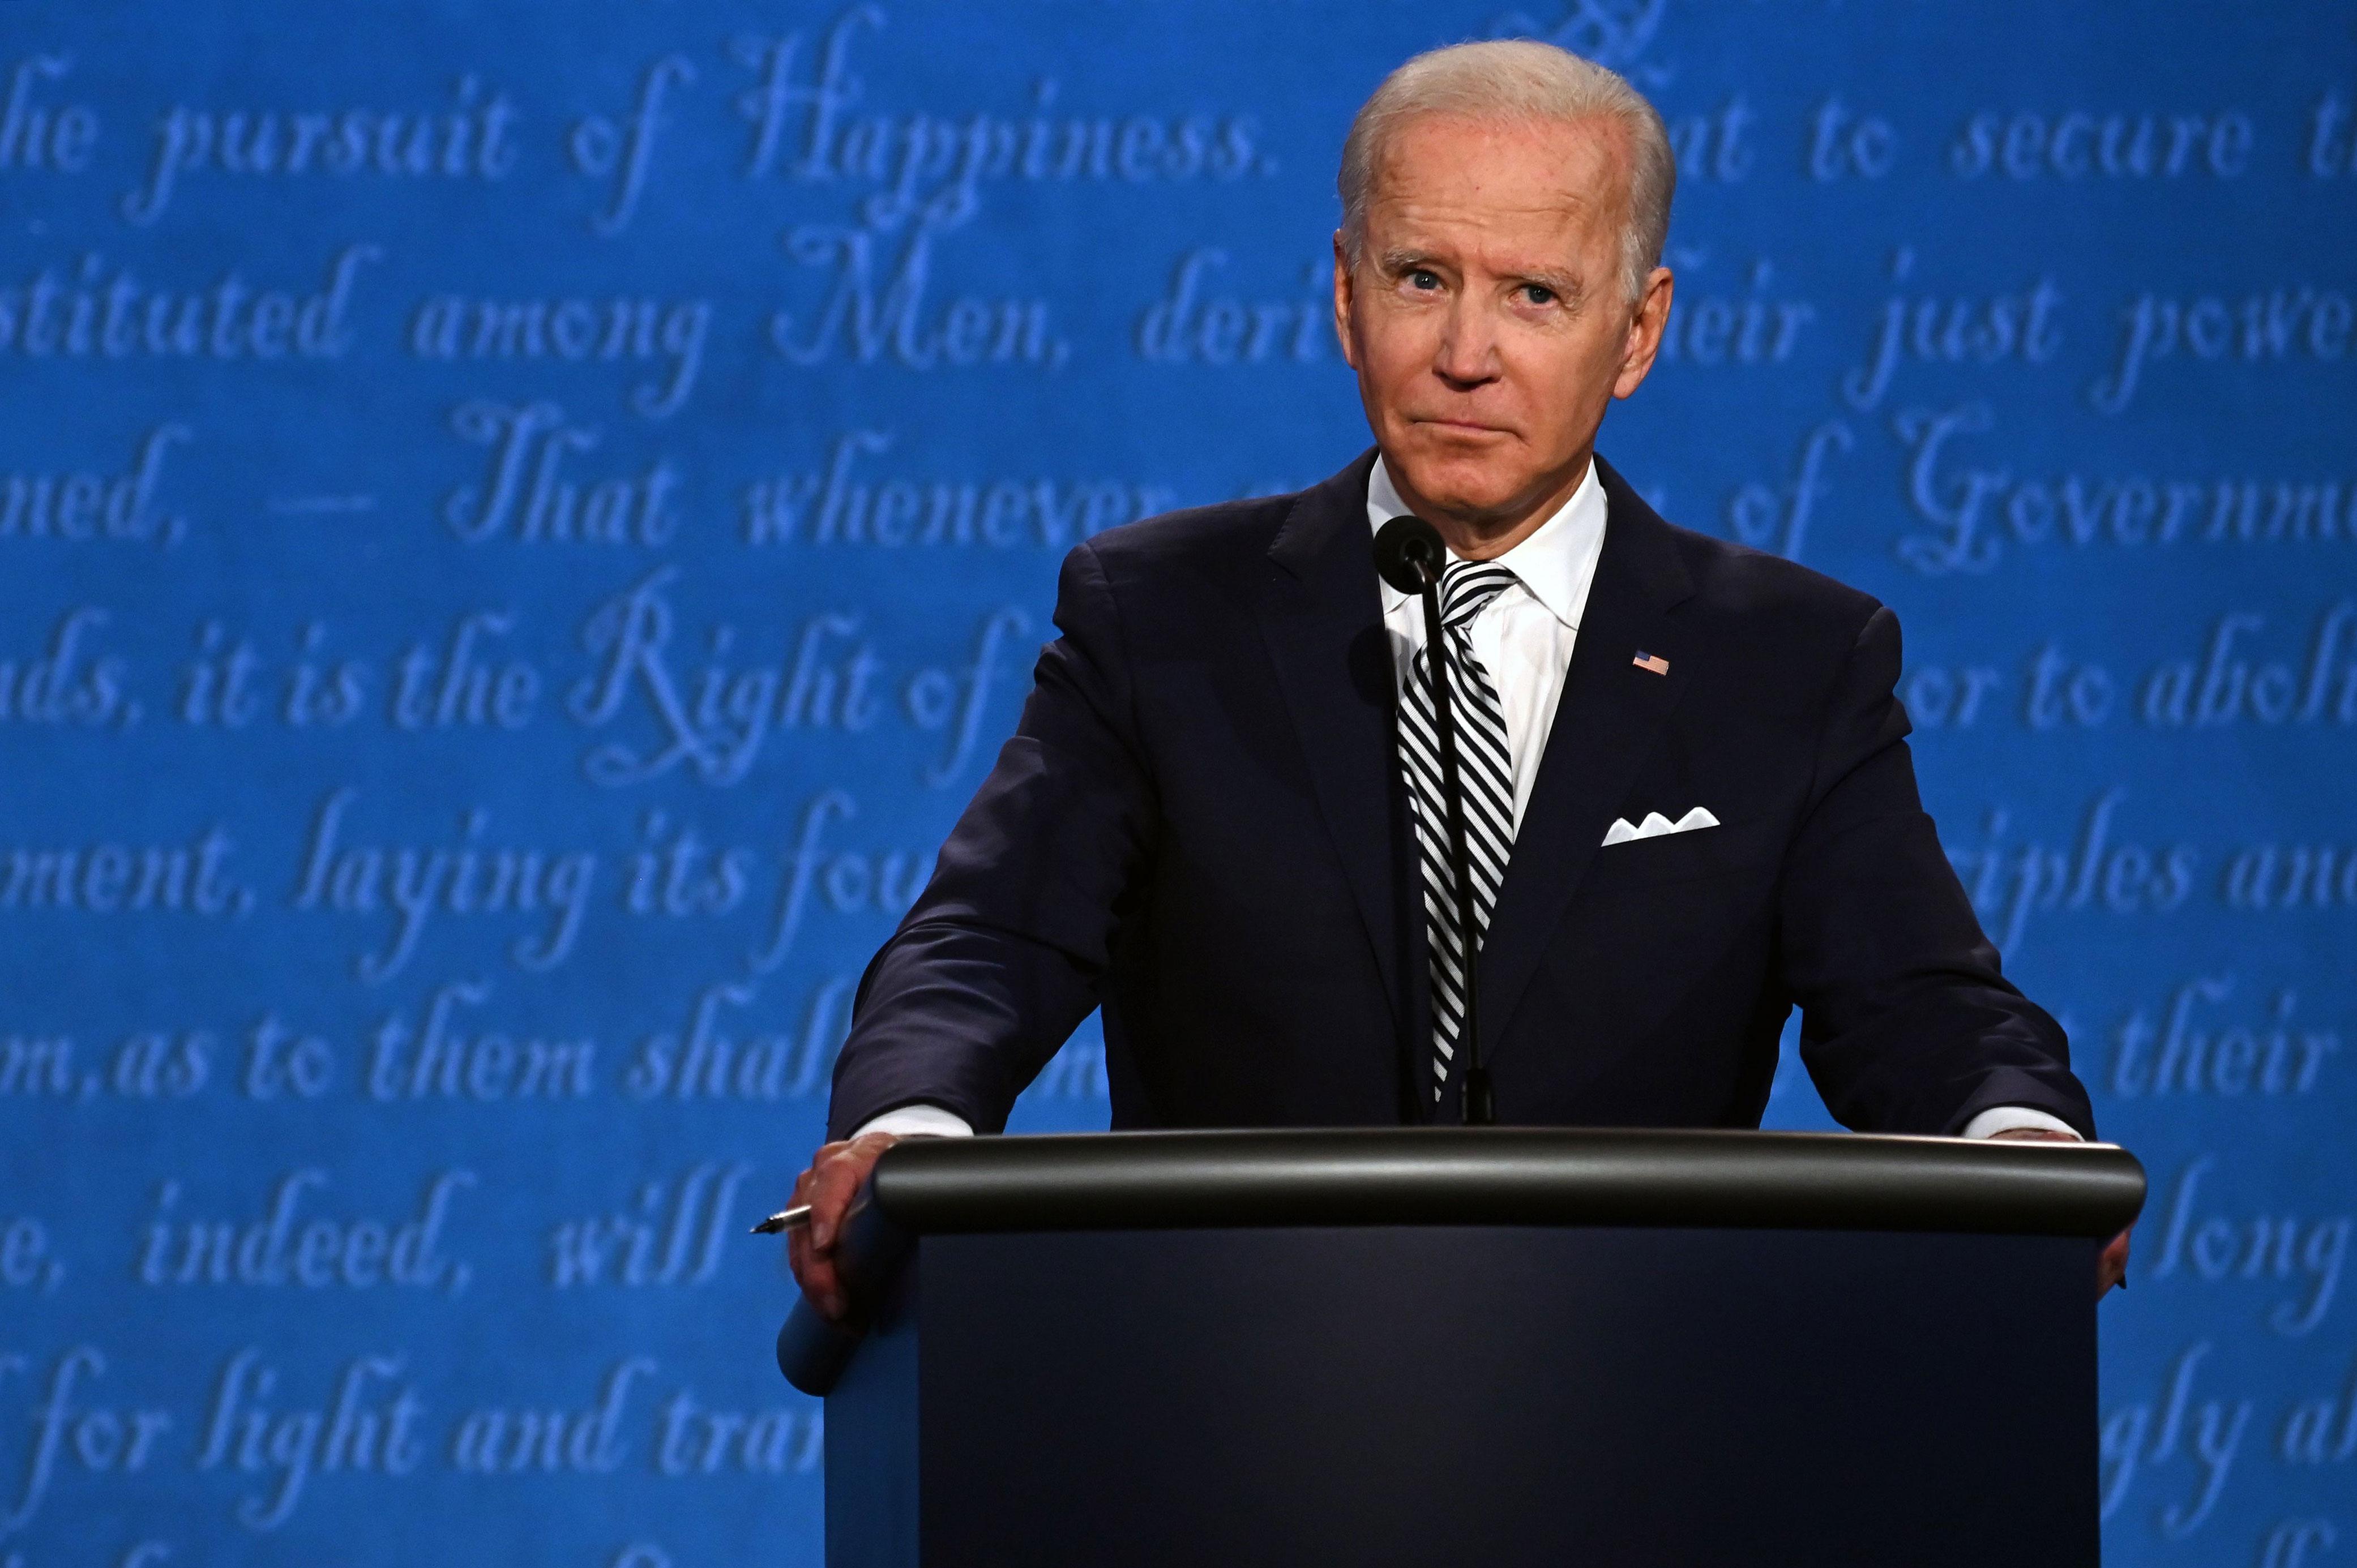 Democratic presidential nominee Joe Biden takes part in the first presidential debate in Cleveland on September 29.